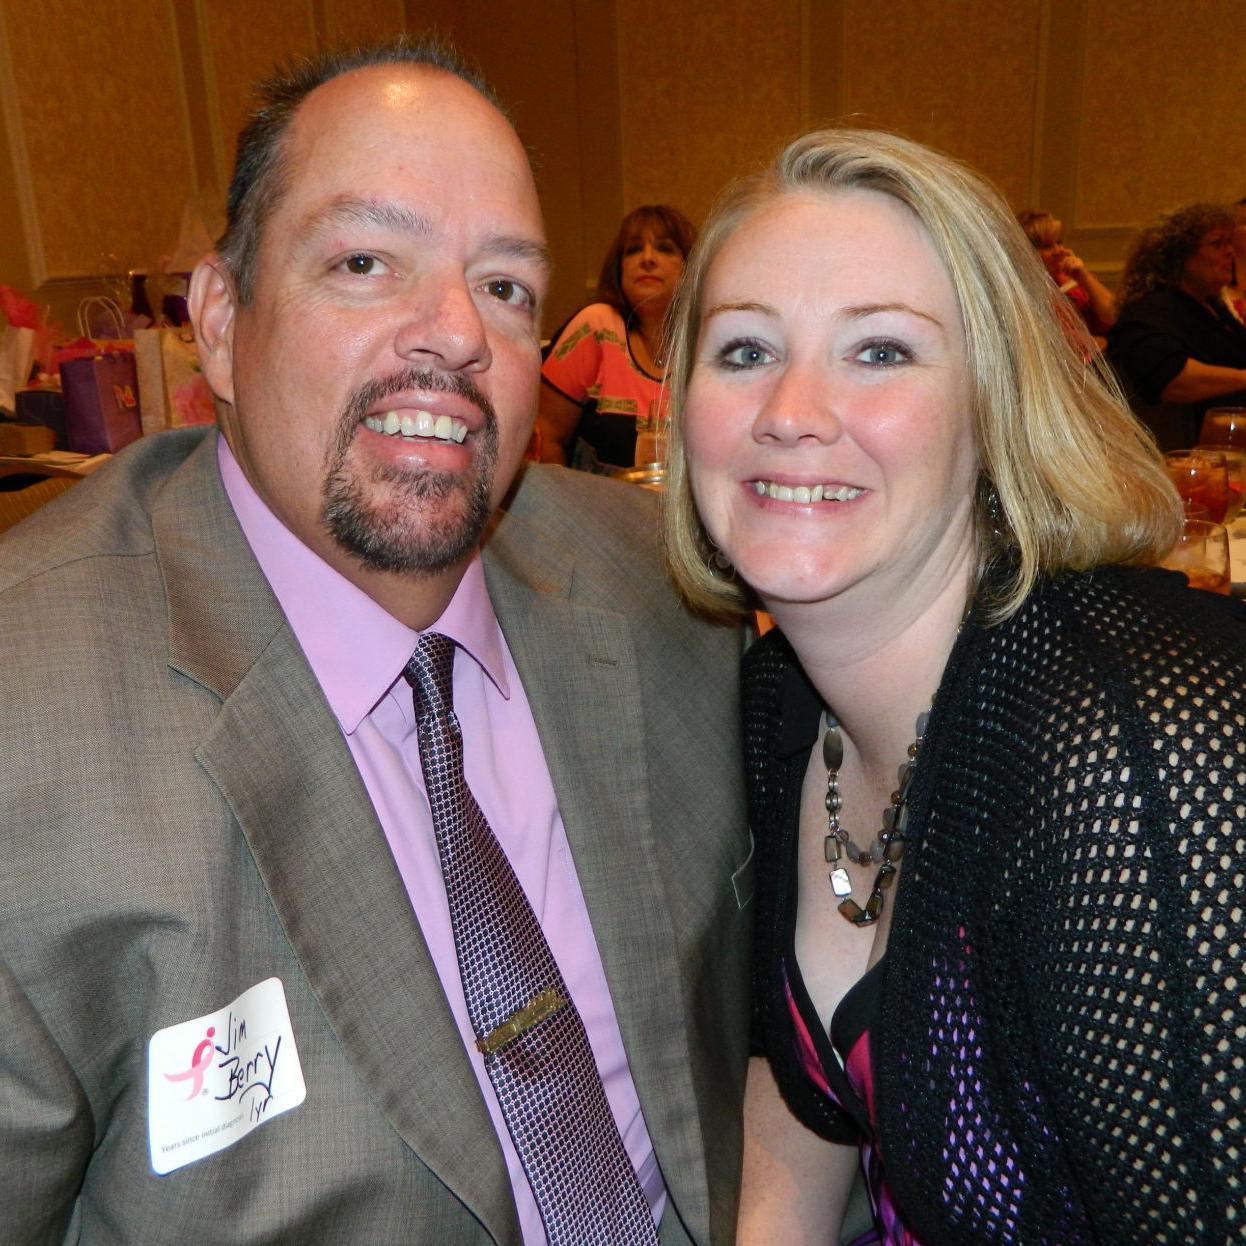 AROUND TOWN: Radio personality Jim Berry a breast cancer survivor